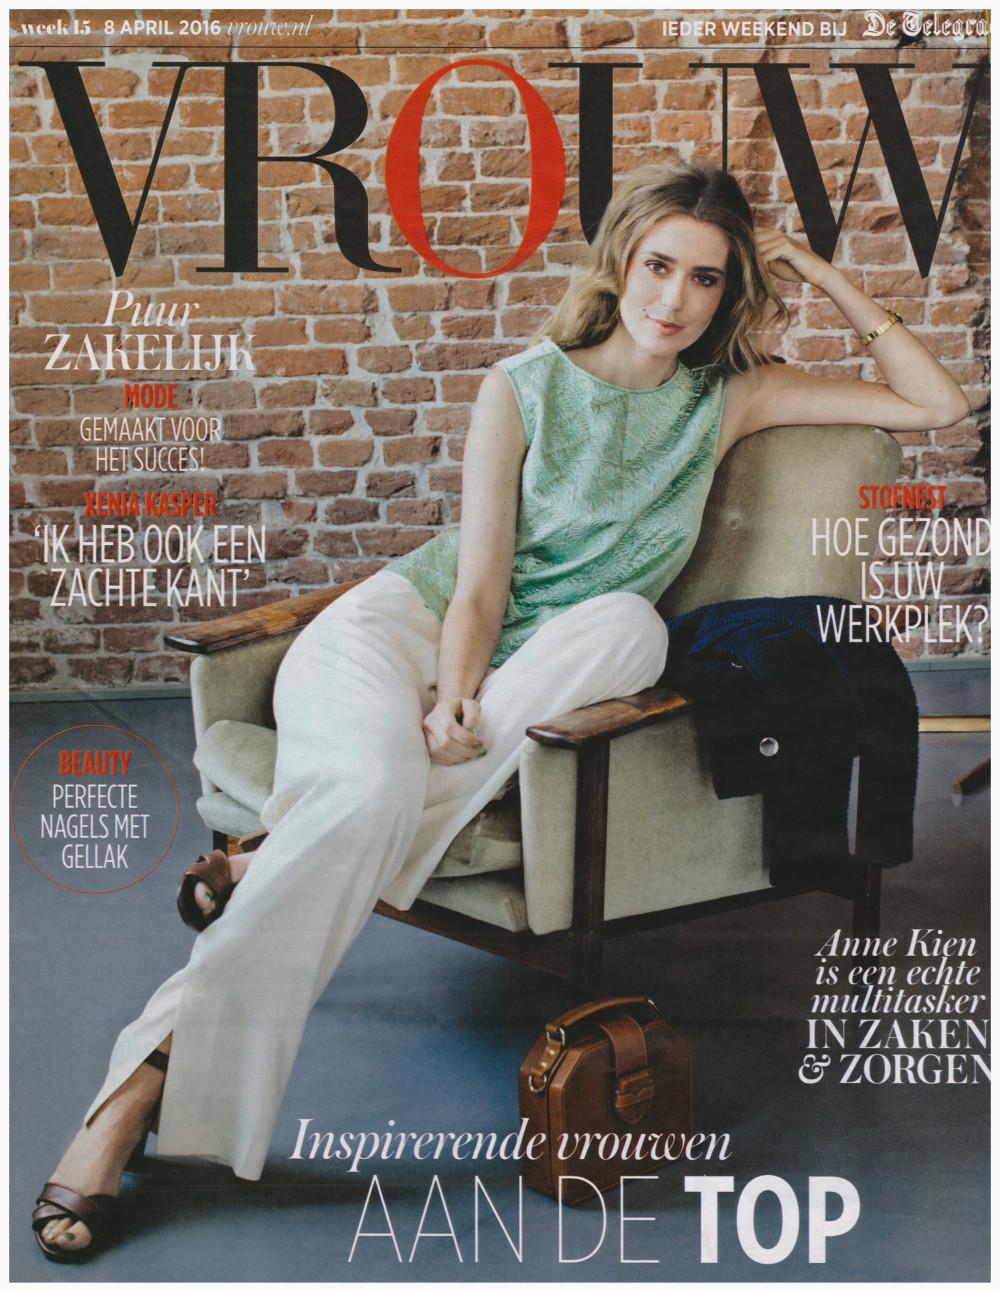 Topvrouwen Vrouw - magazine cover 08-04-2016